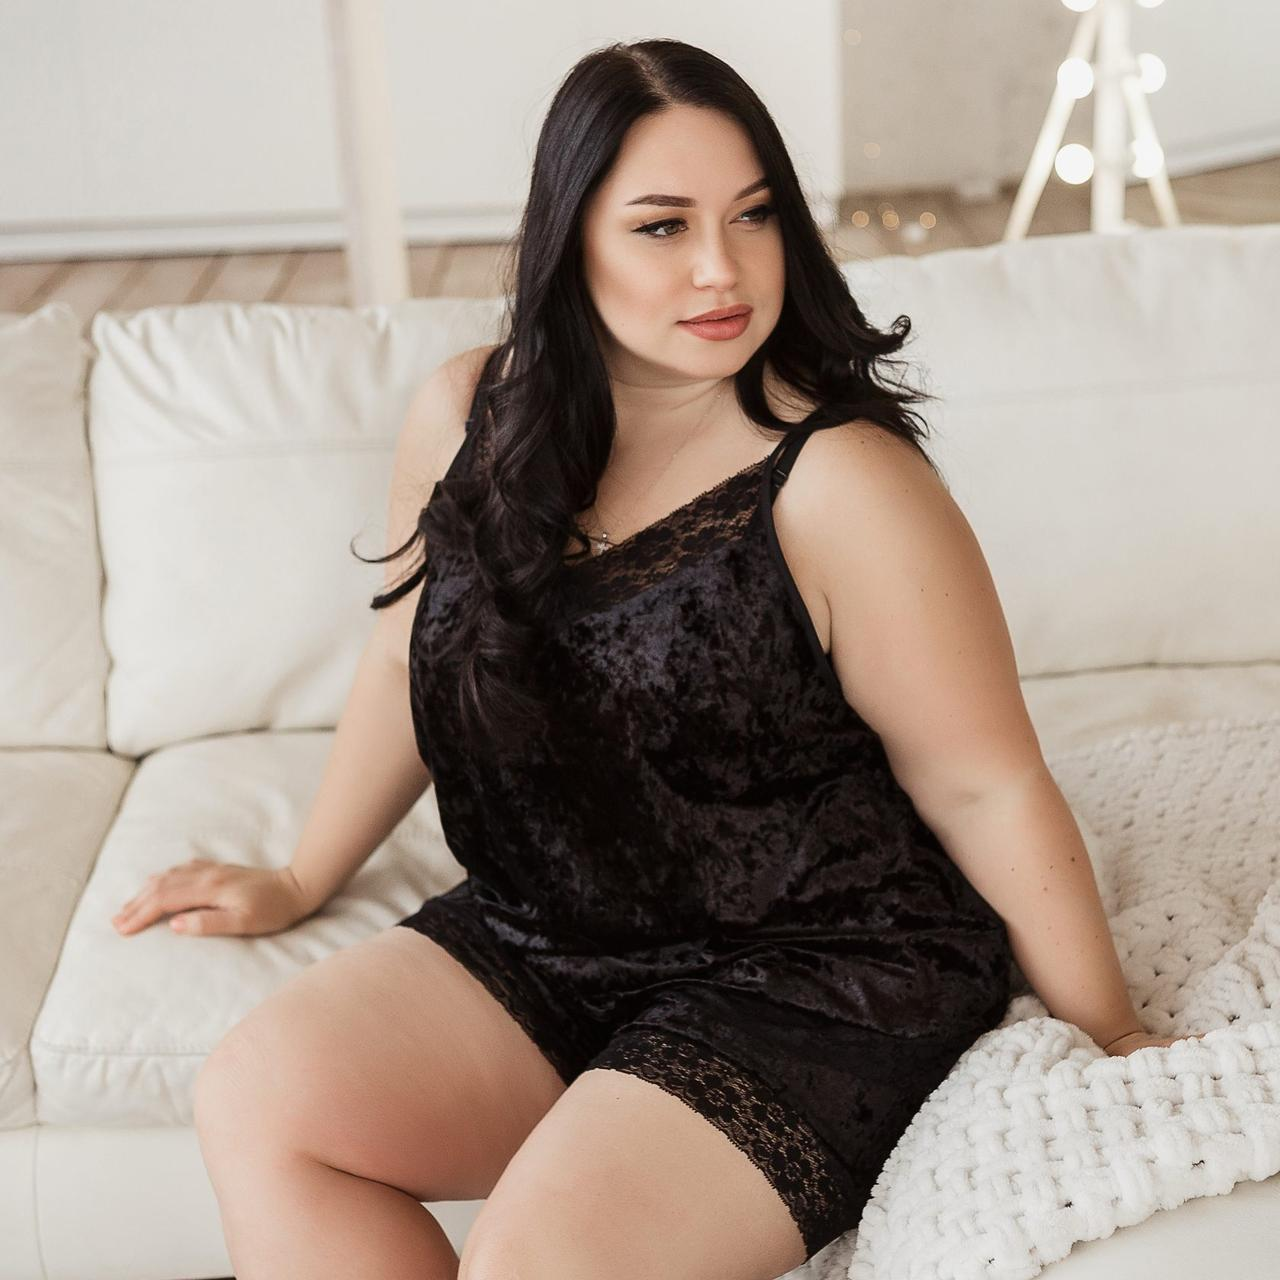 Черная пижама без кружева на маечке из мраморного велюра на ночь, размер 48-50